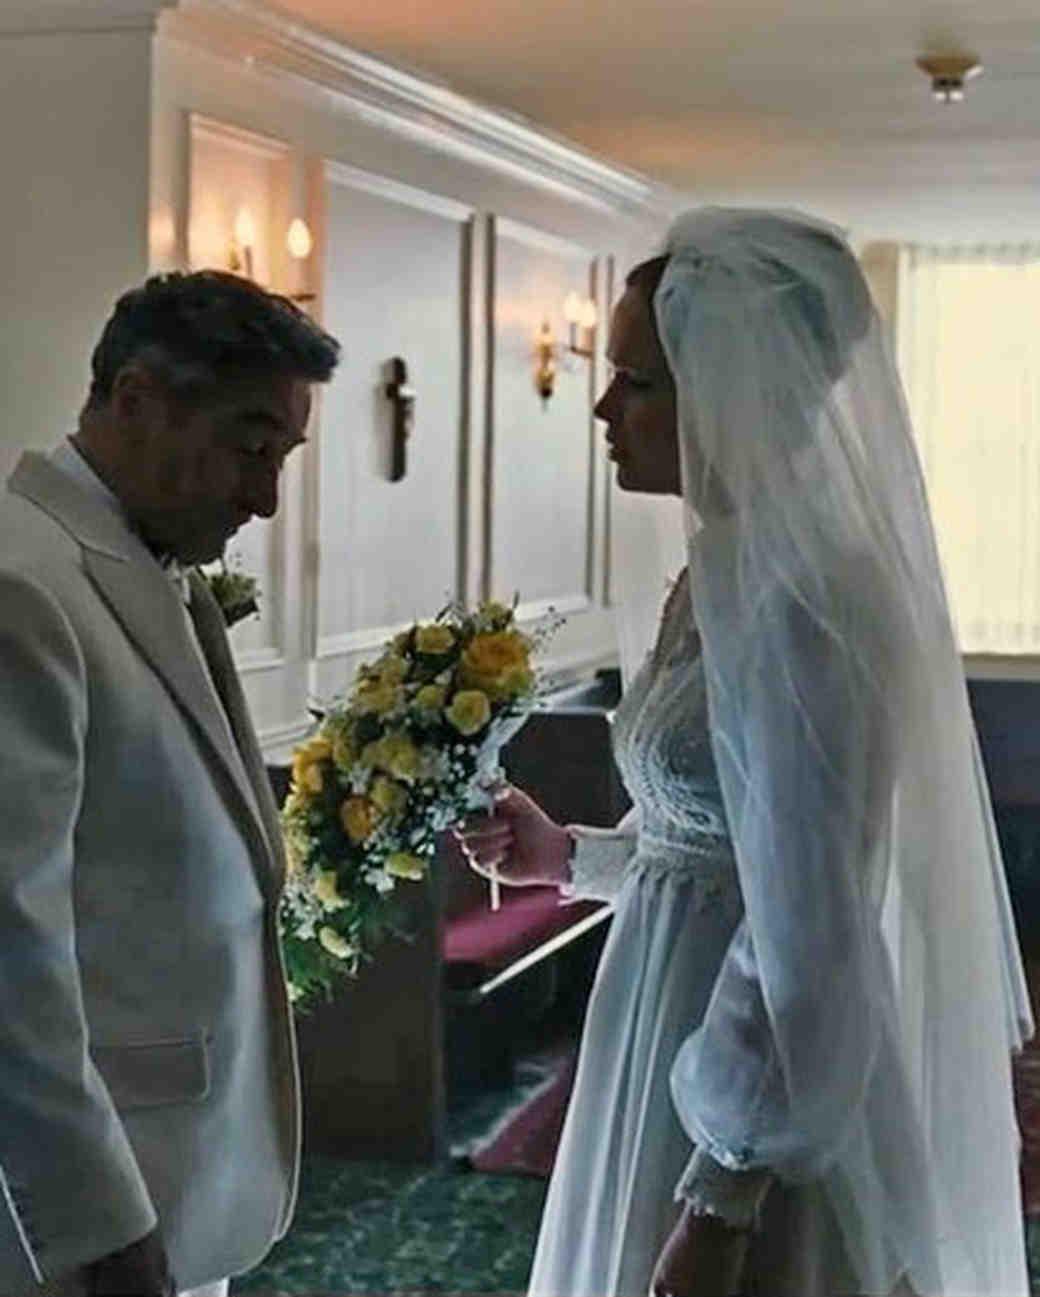 movie-wedding-dresses-joy-jennifer-lawrence-0316.jpg